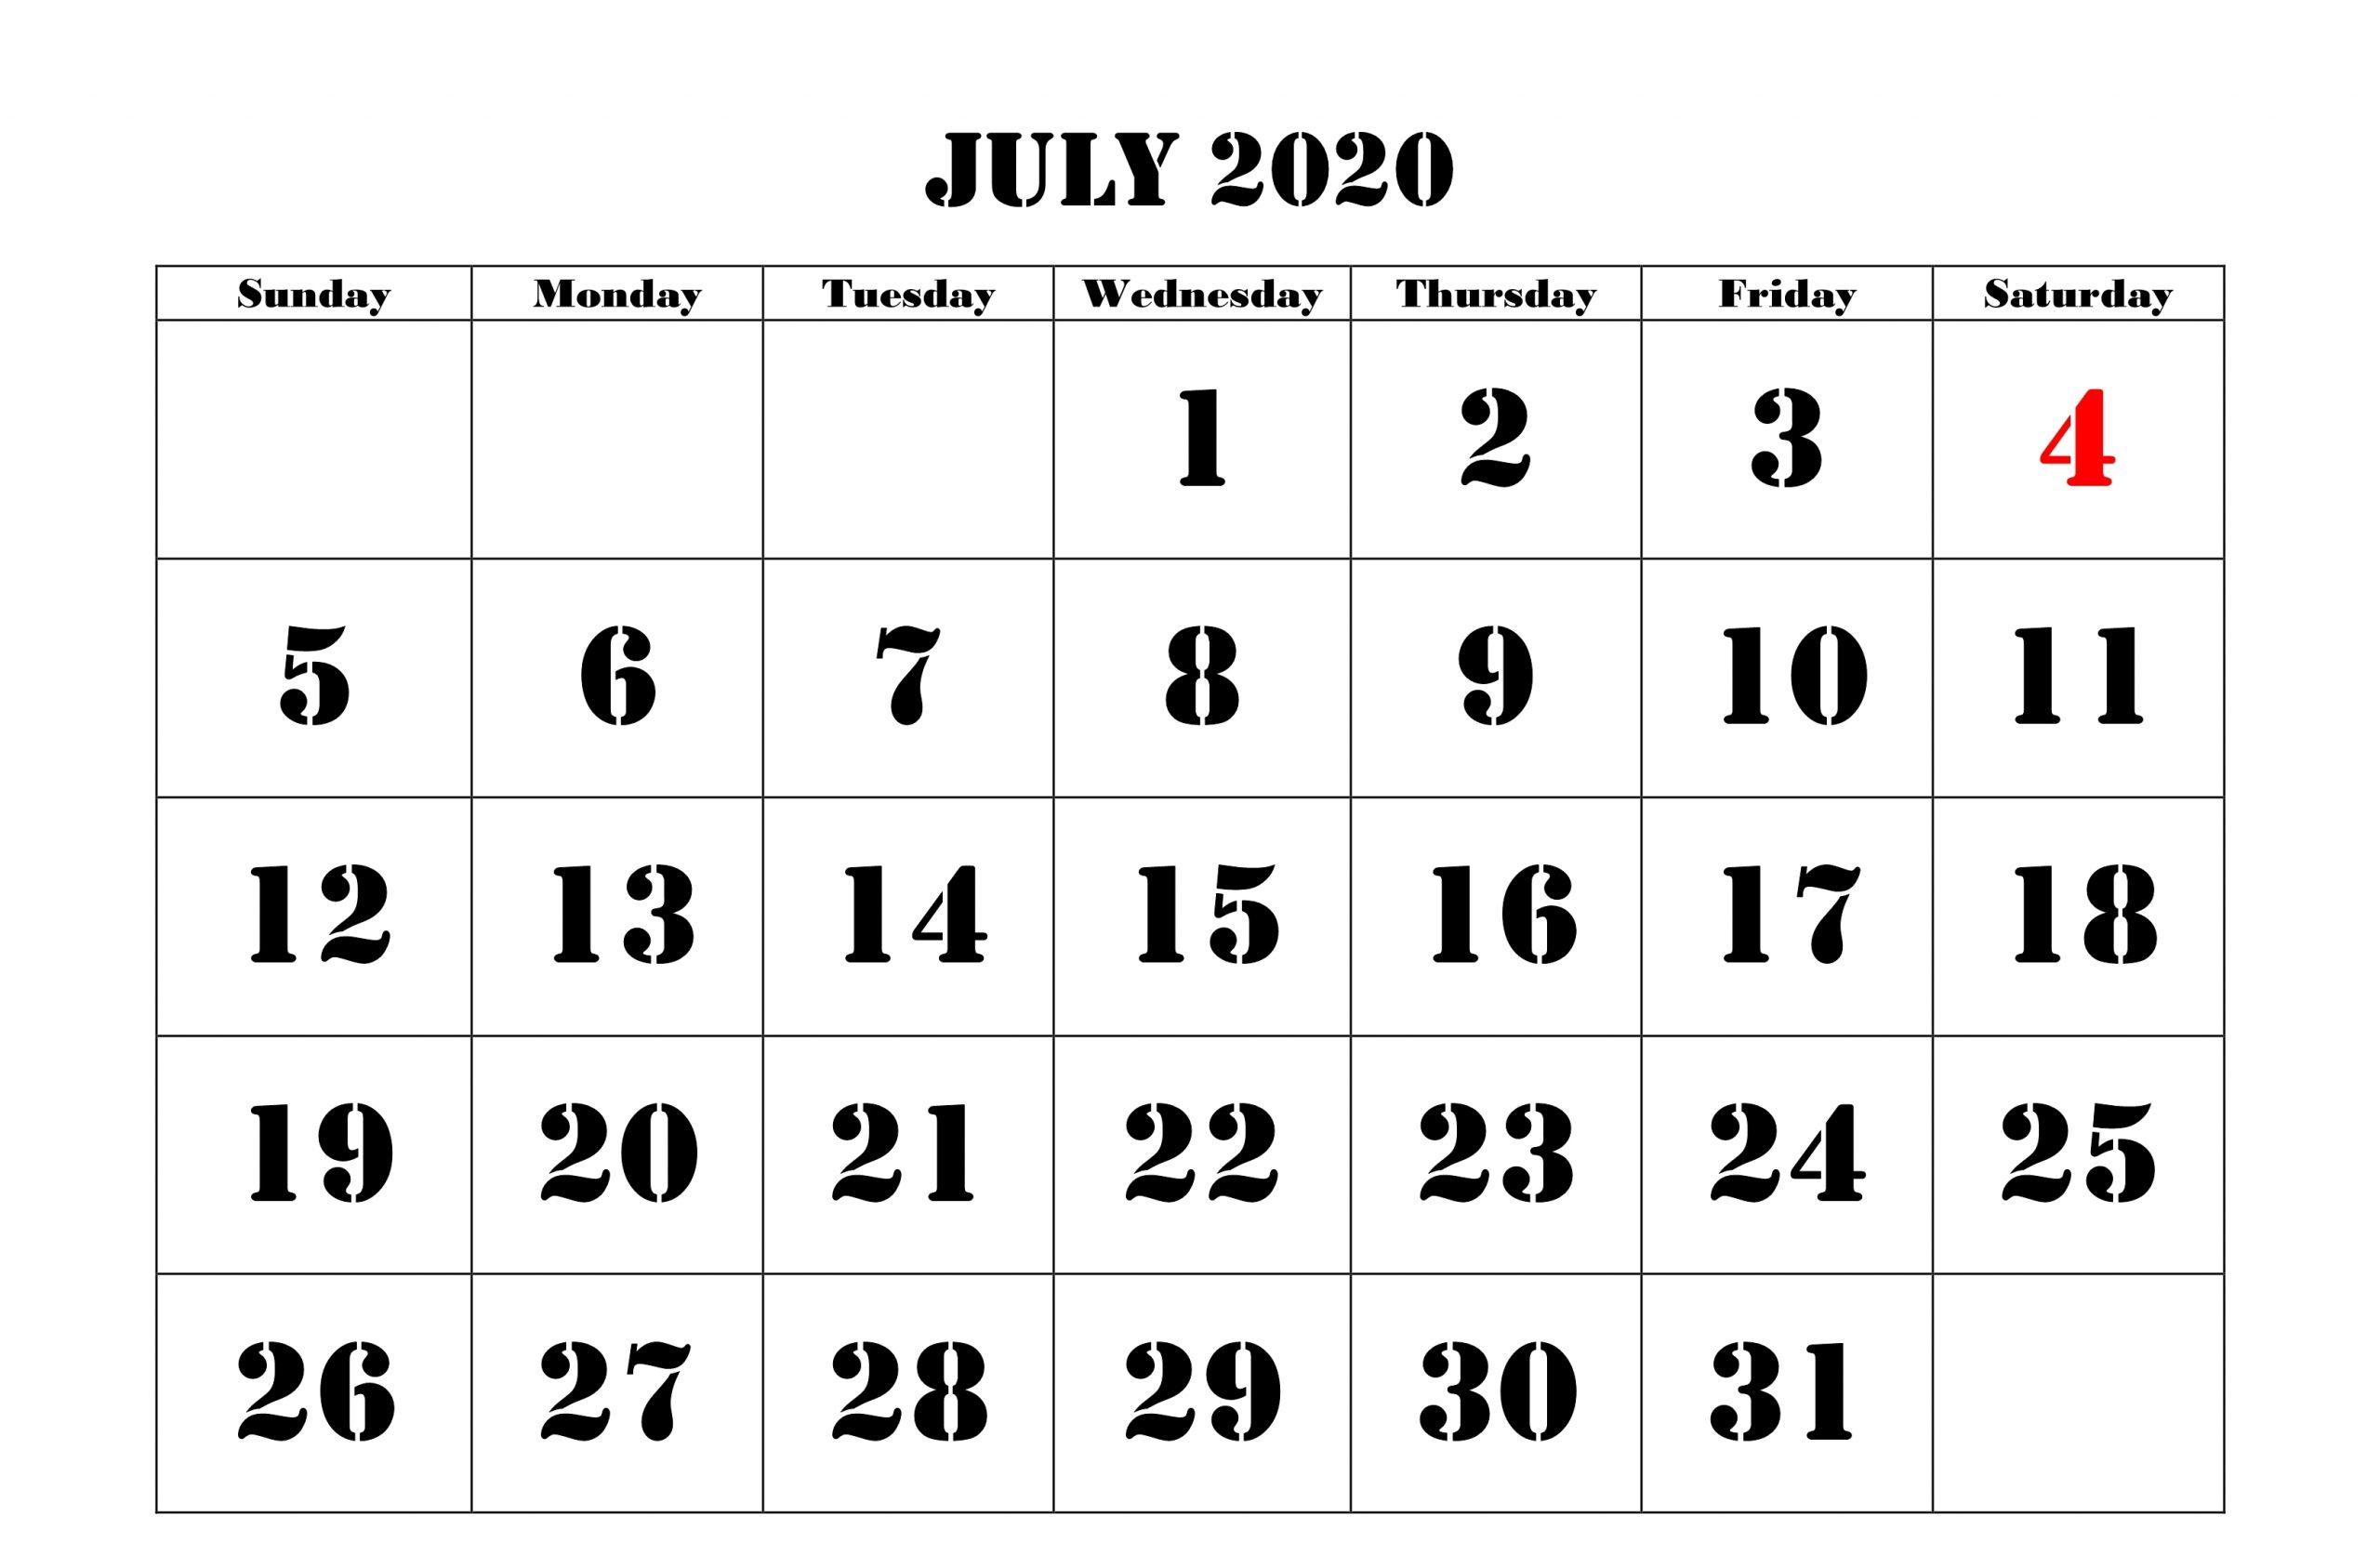 July 2020 Calendar Excel